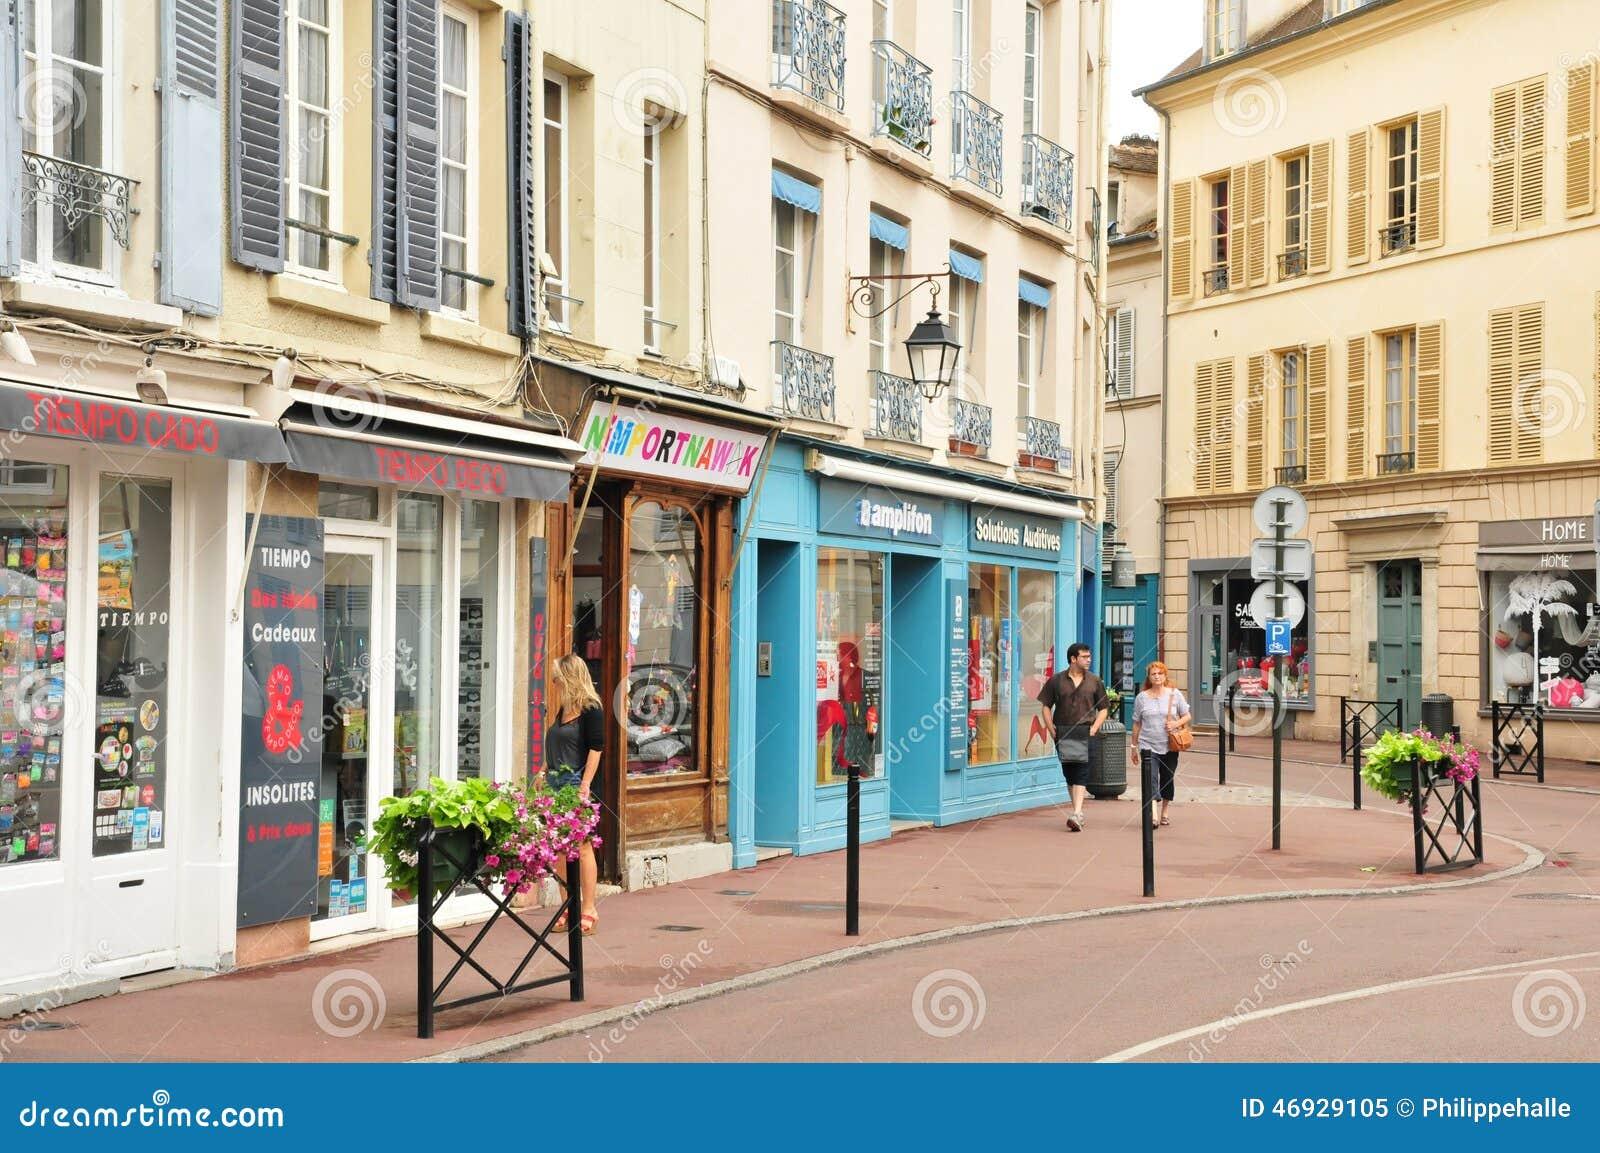 Home St Germain En Laye france, the picturesque city of saint germain en laye